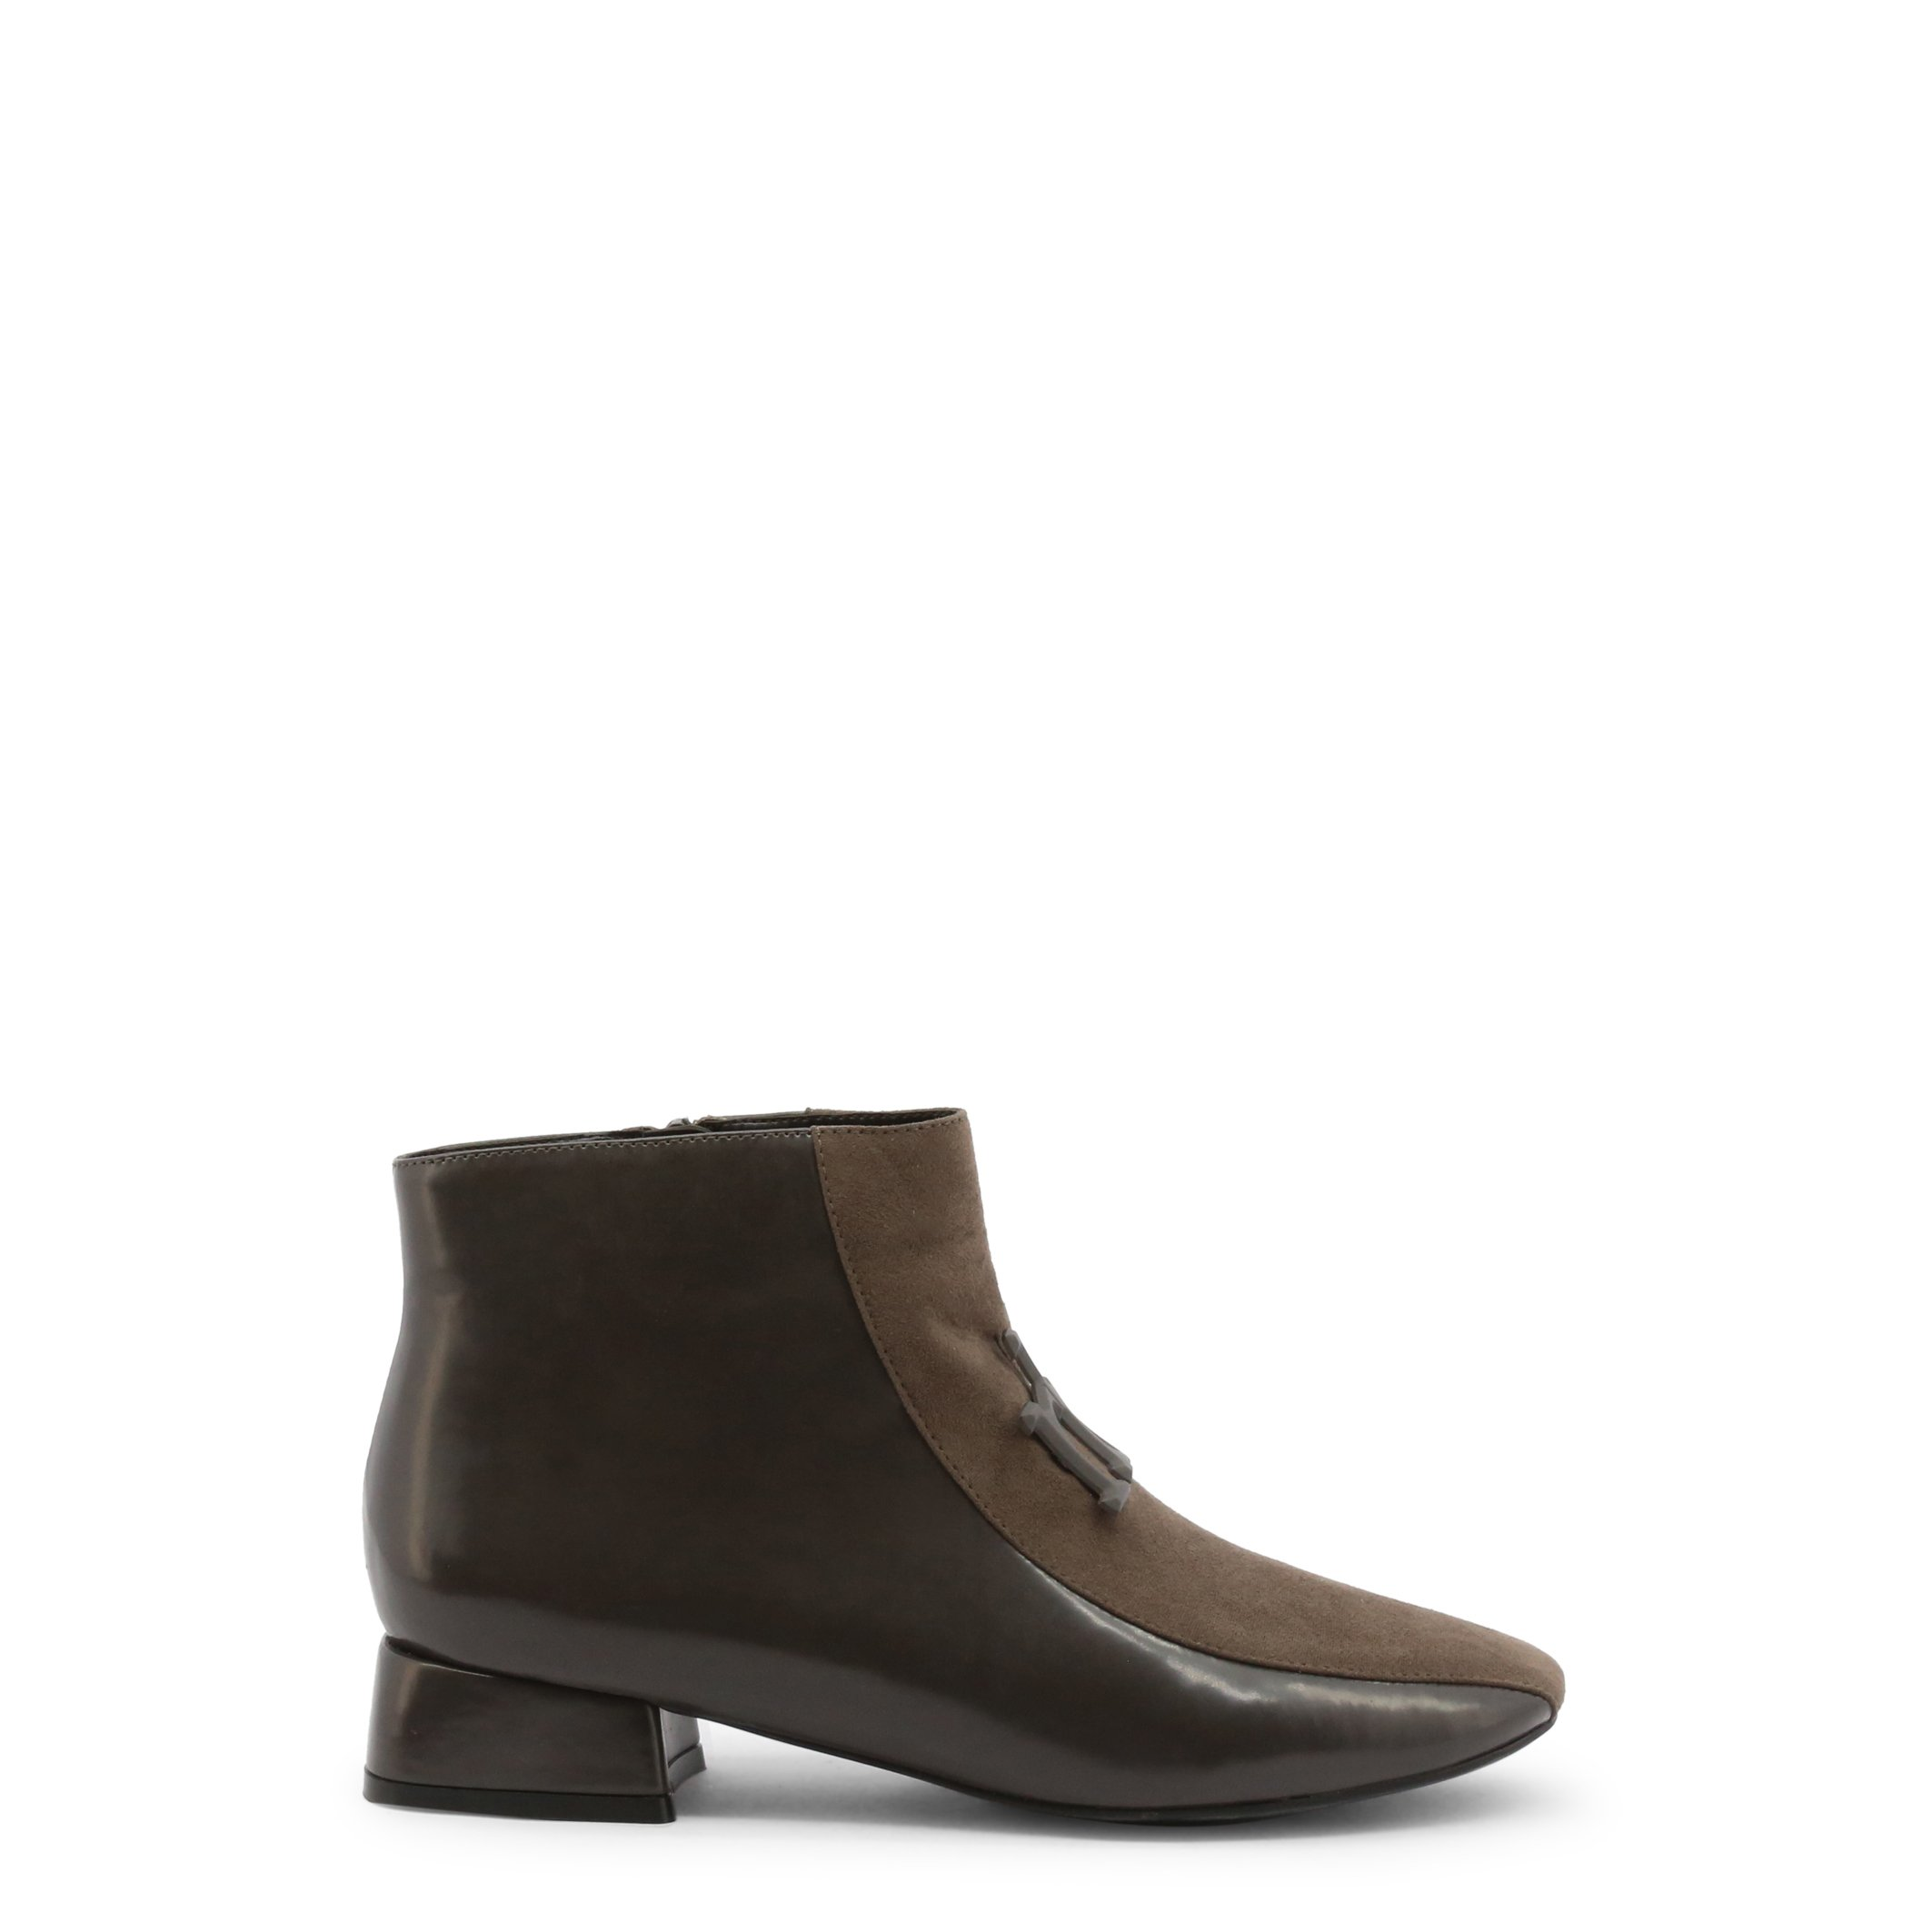 Roccobarocco Women's Ankle Boots Black 342842 - grey EU 37